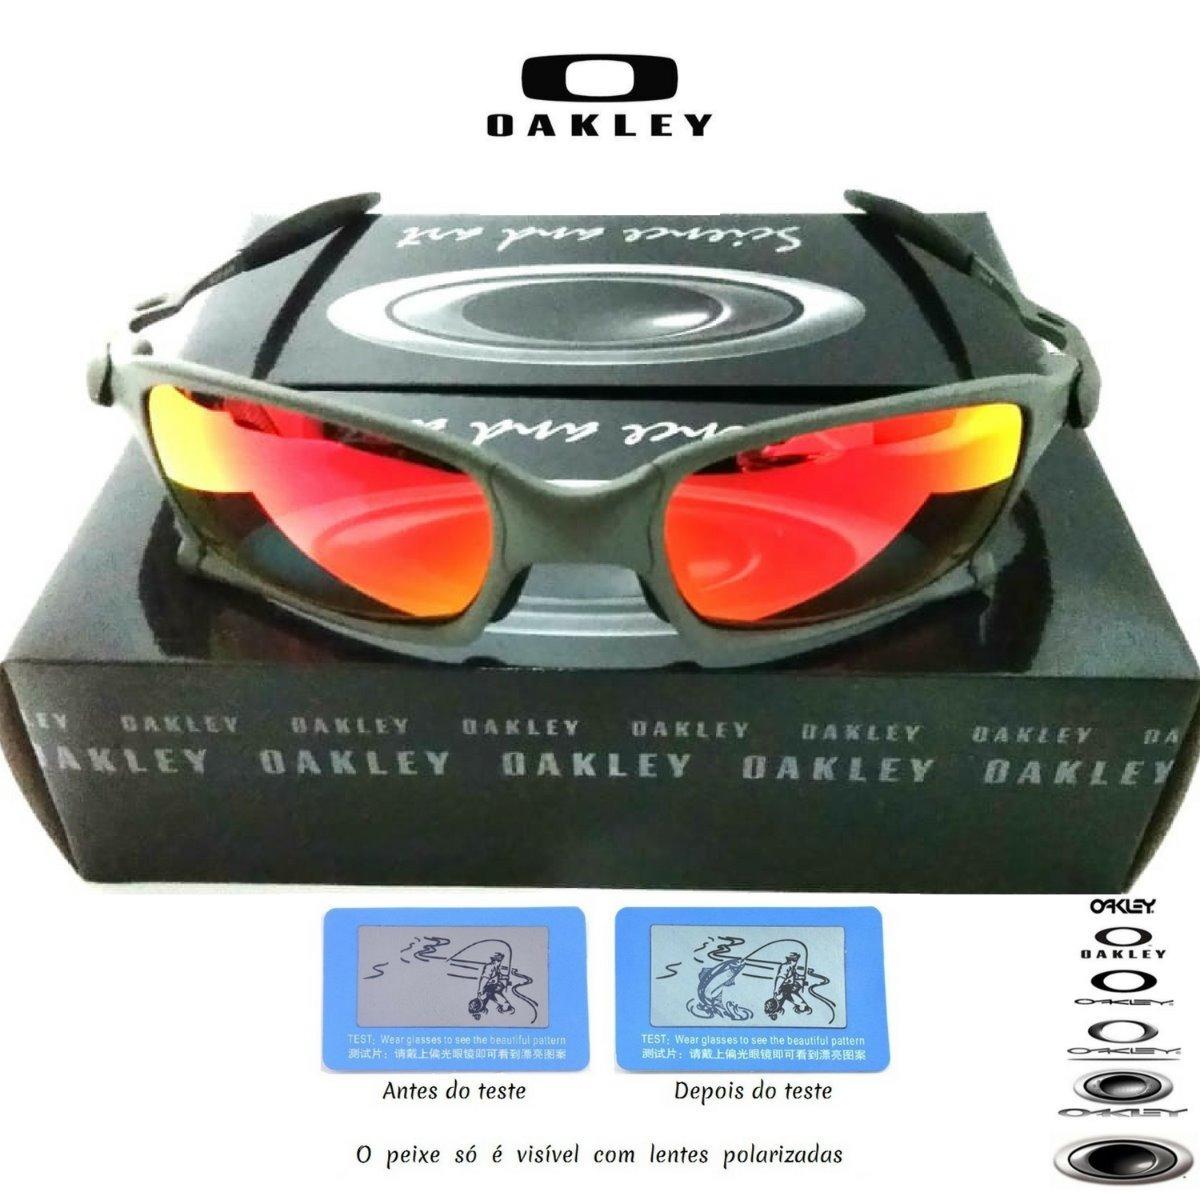 592e6d8b2417a Óculos Oakley Double Xx 24k Squared Rubi Juliet Romeo2 - R  89,90 em ...